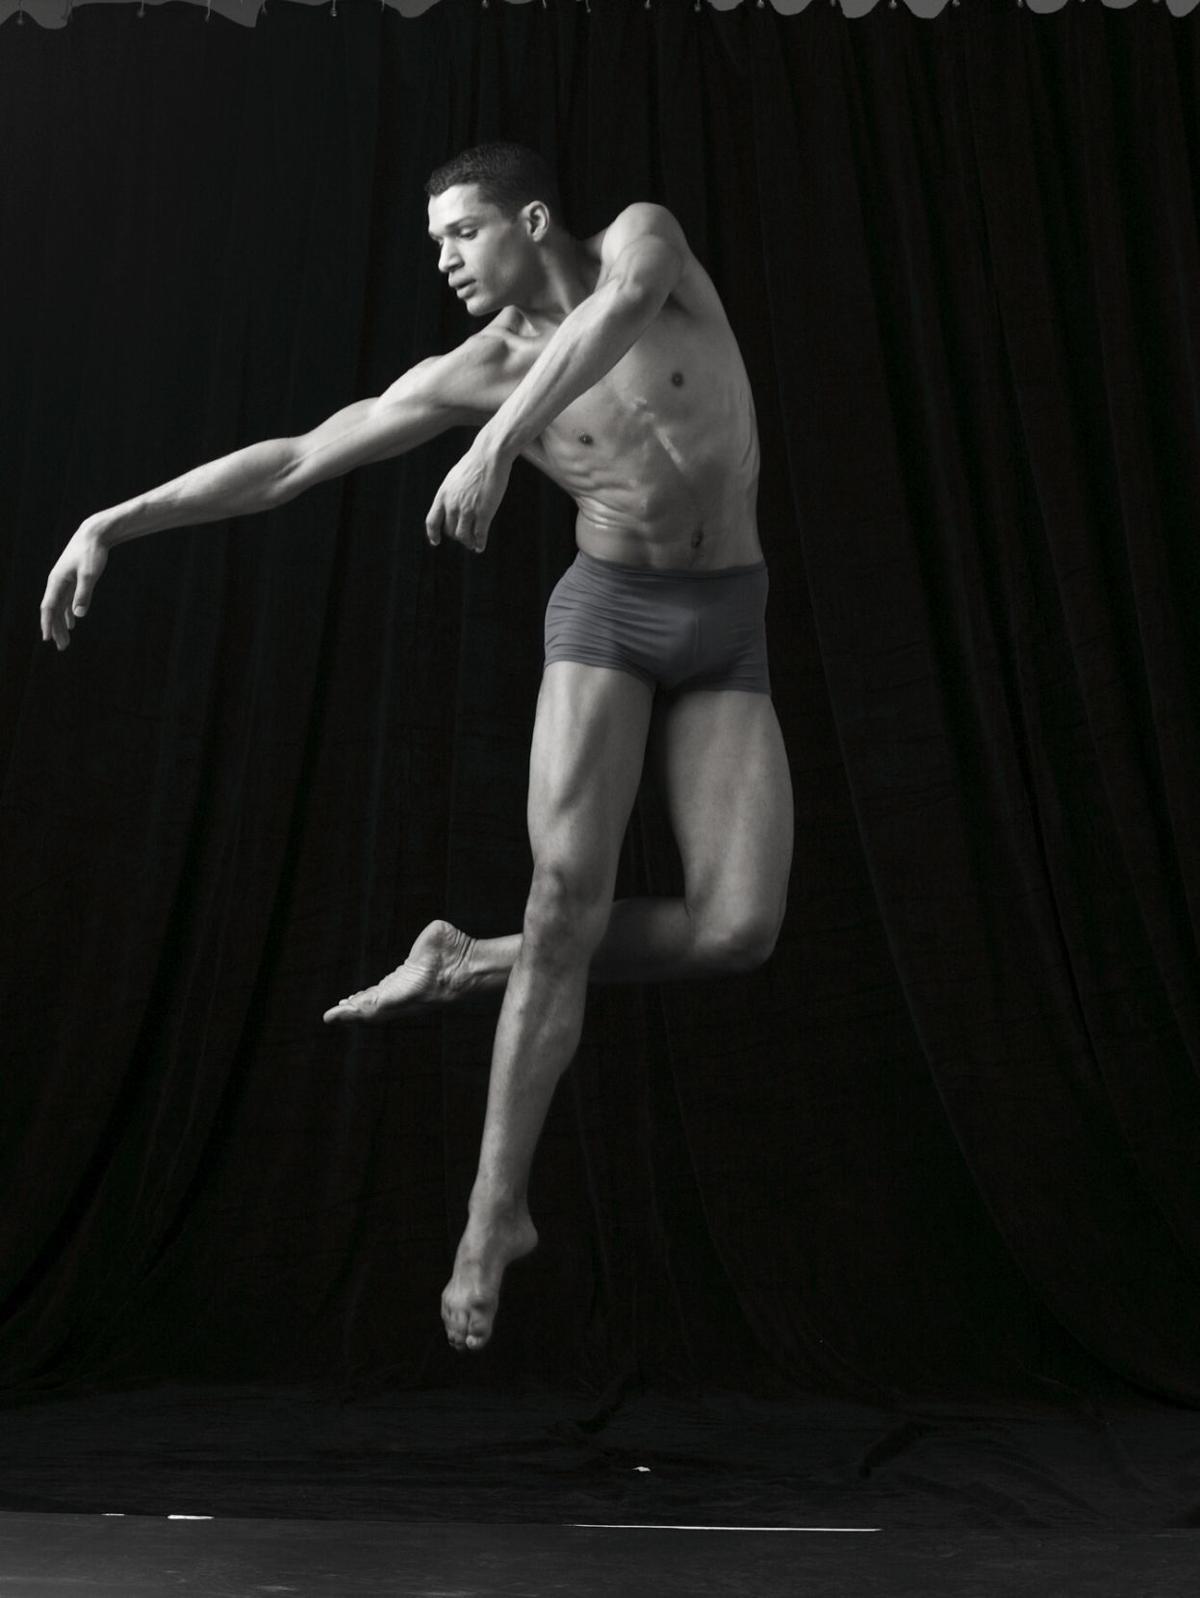 Adam McKinney